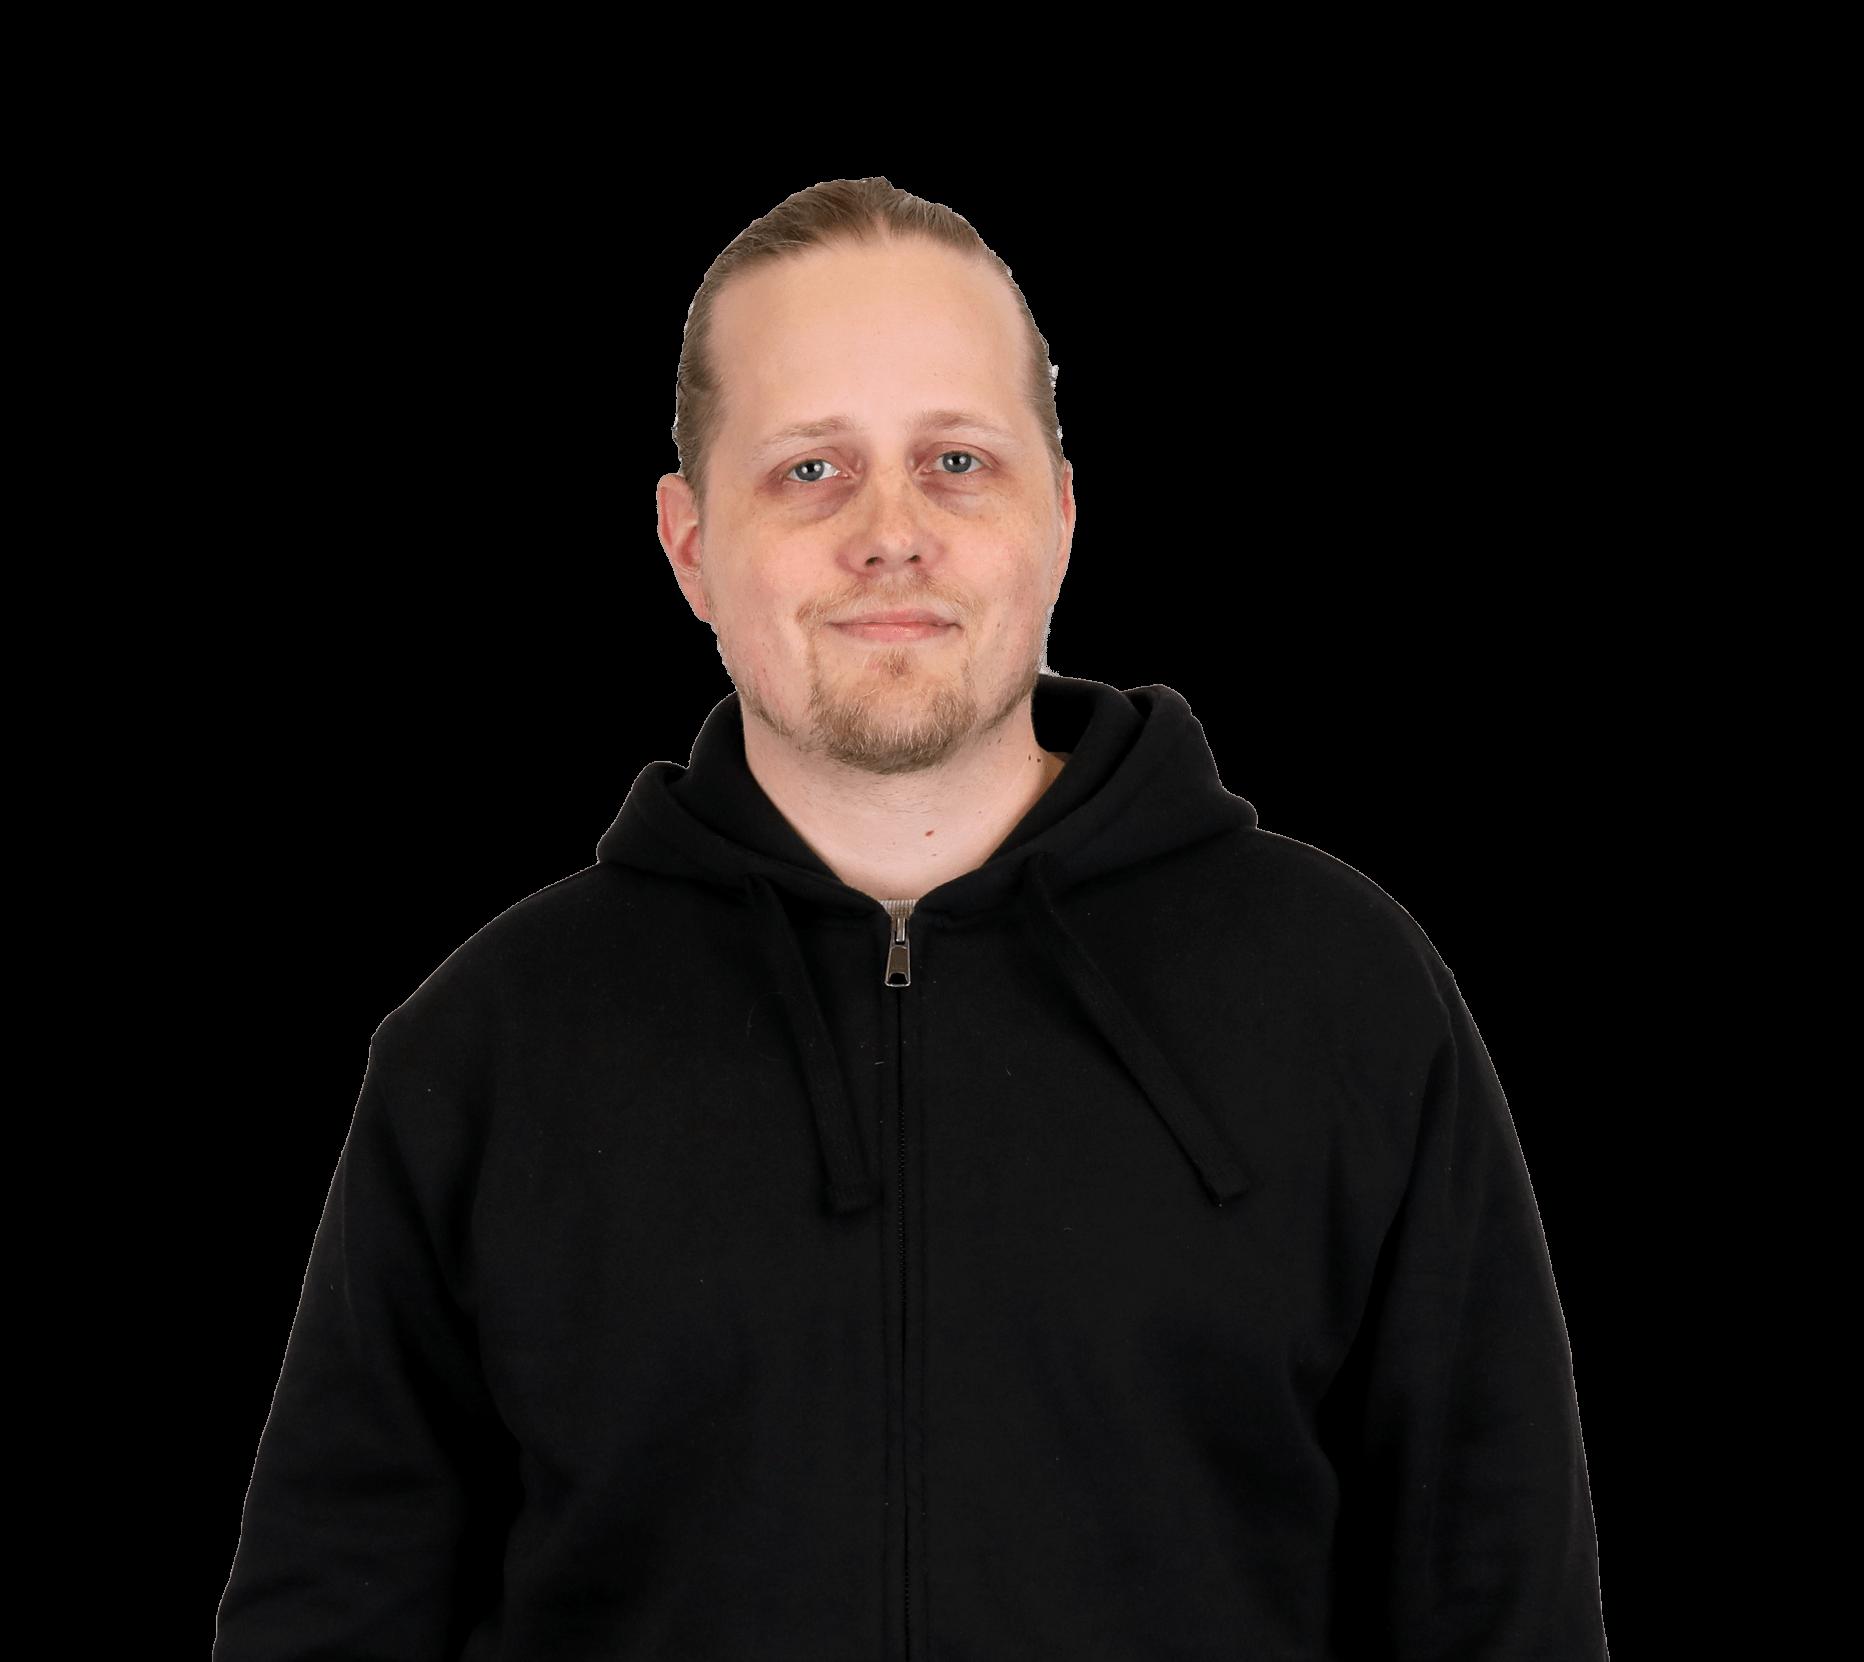 Juho Anttila